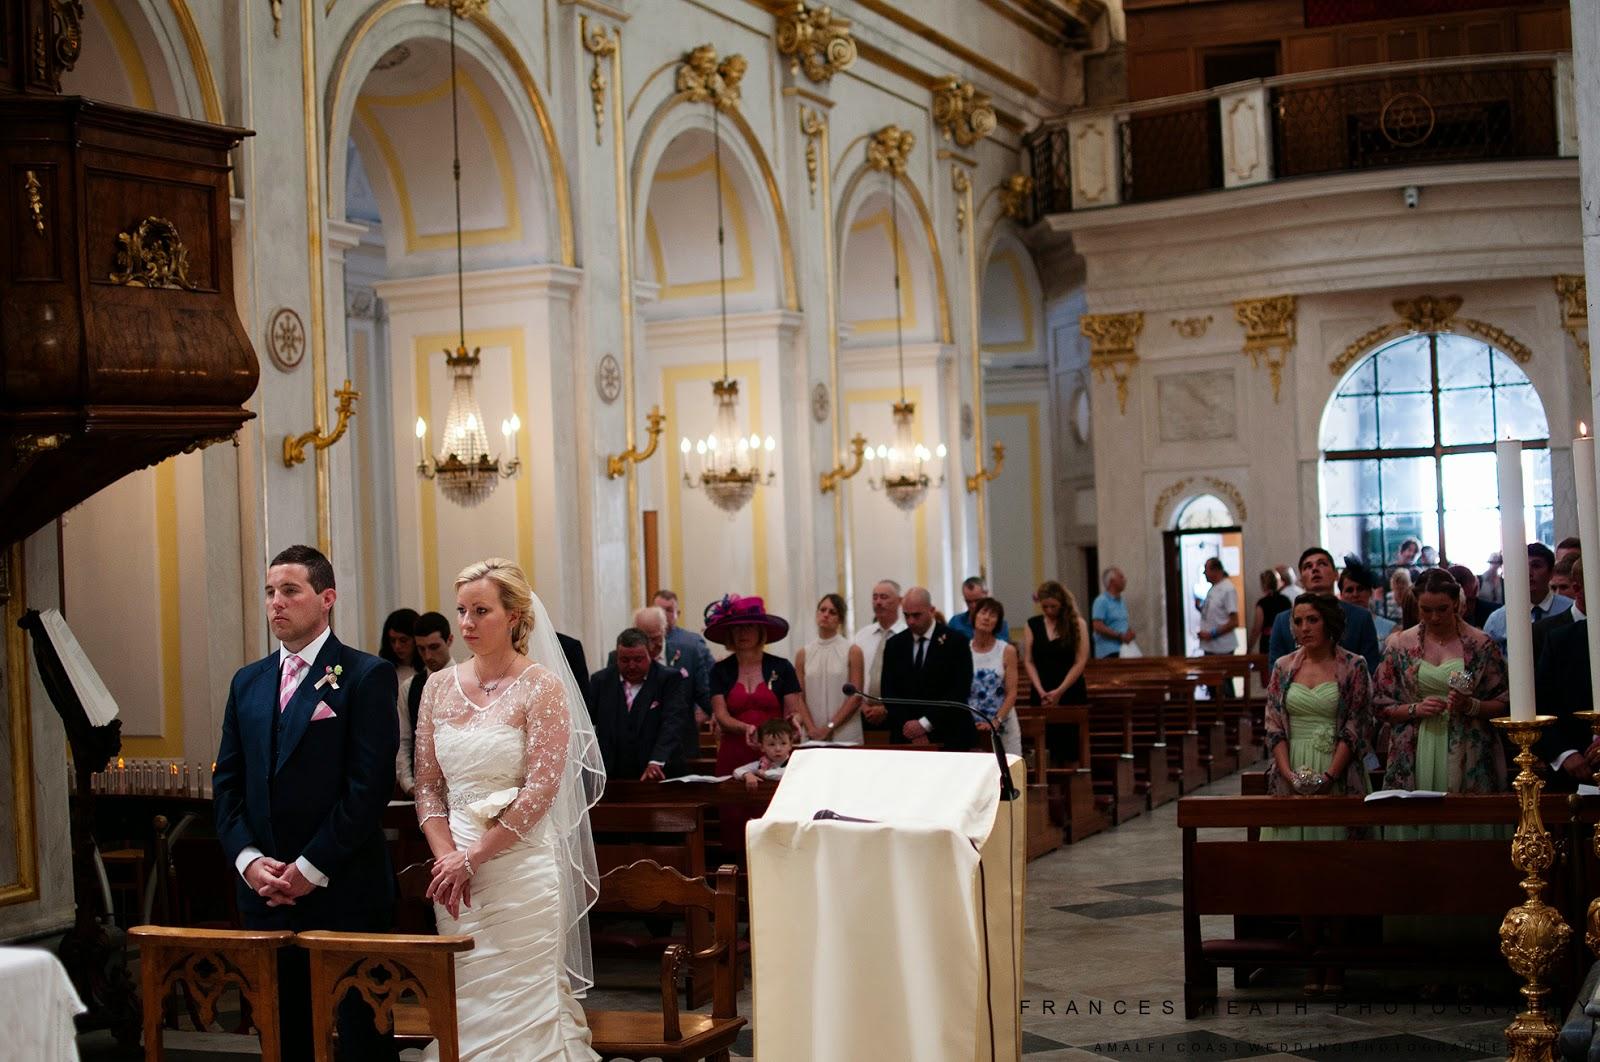 Chruch wedding at Santa Maria Assunta in Positano